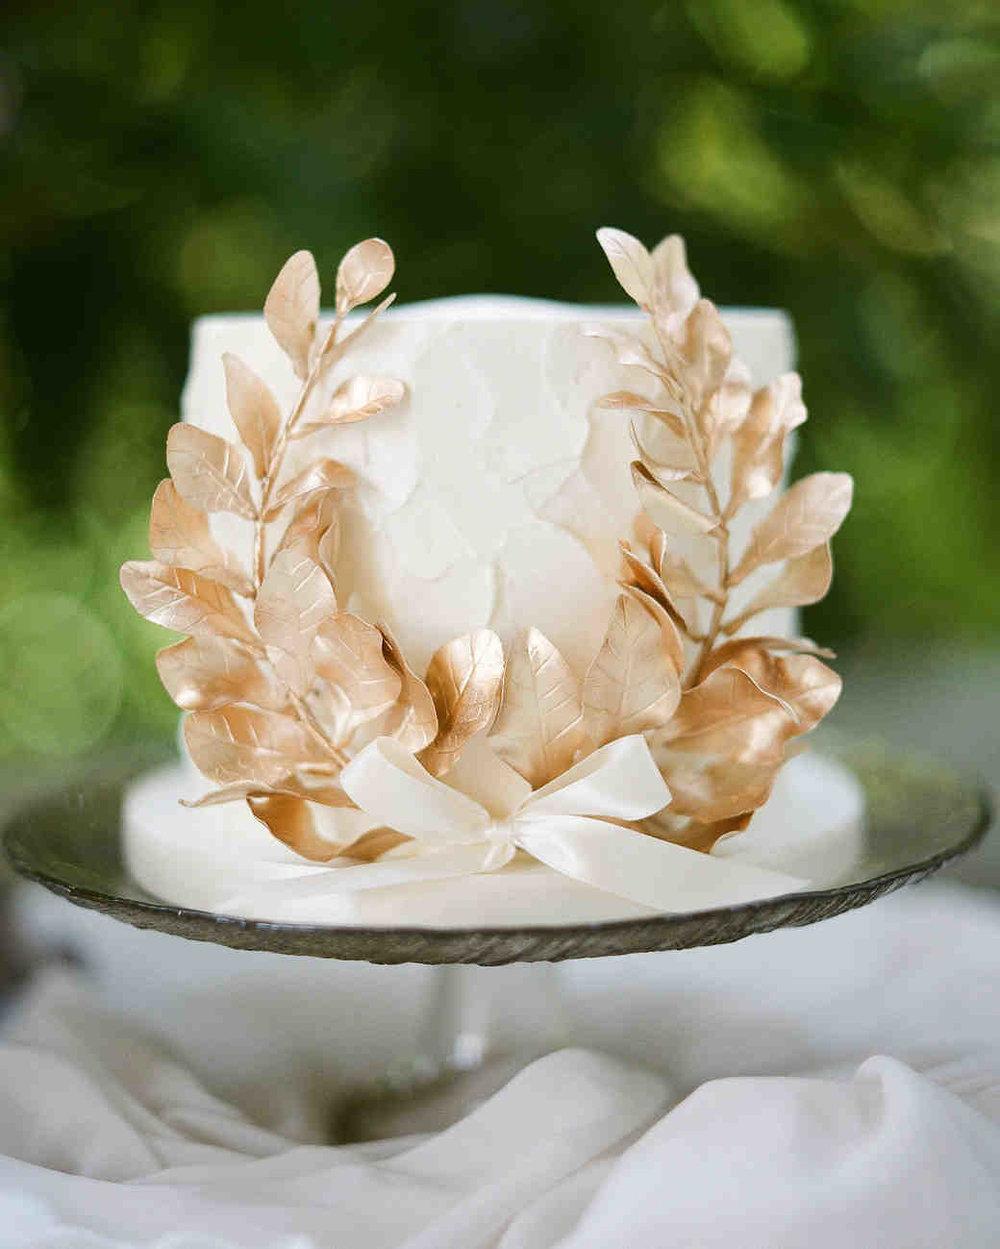 gloria-zee-wedding-cake-f0182-6482616-0318_vert.jpg